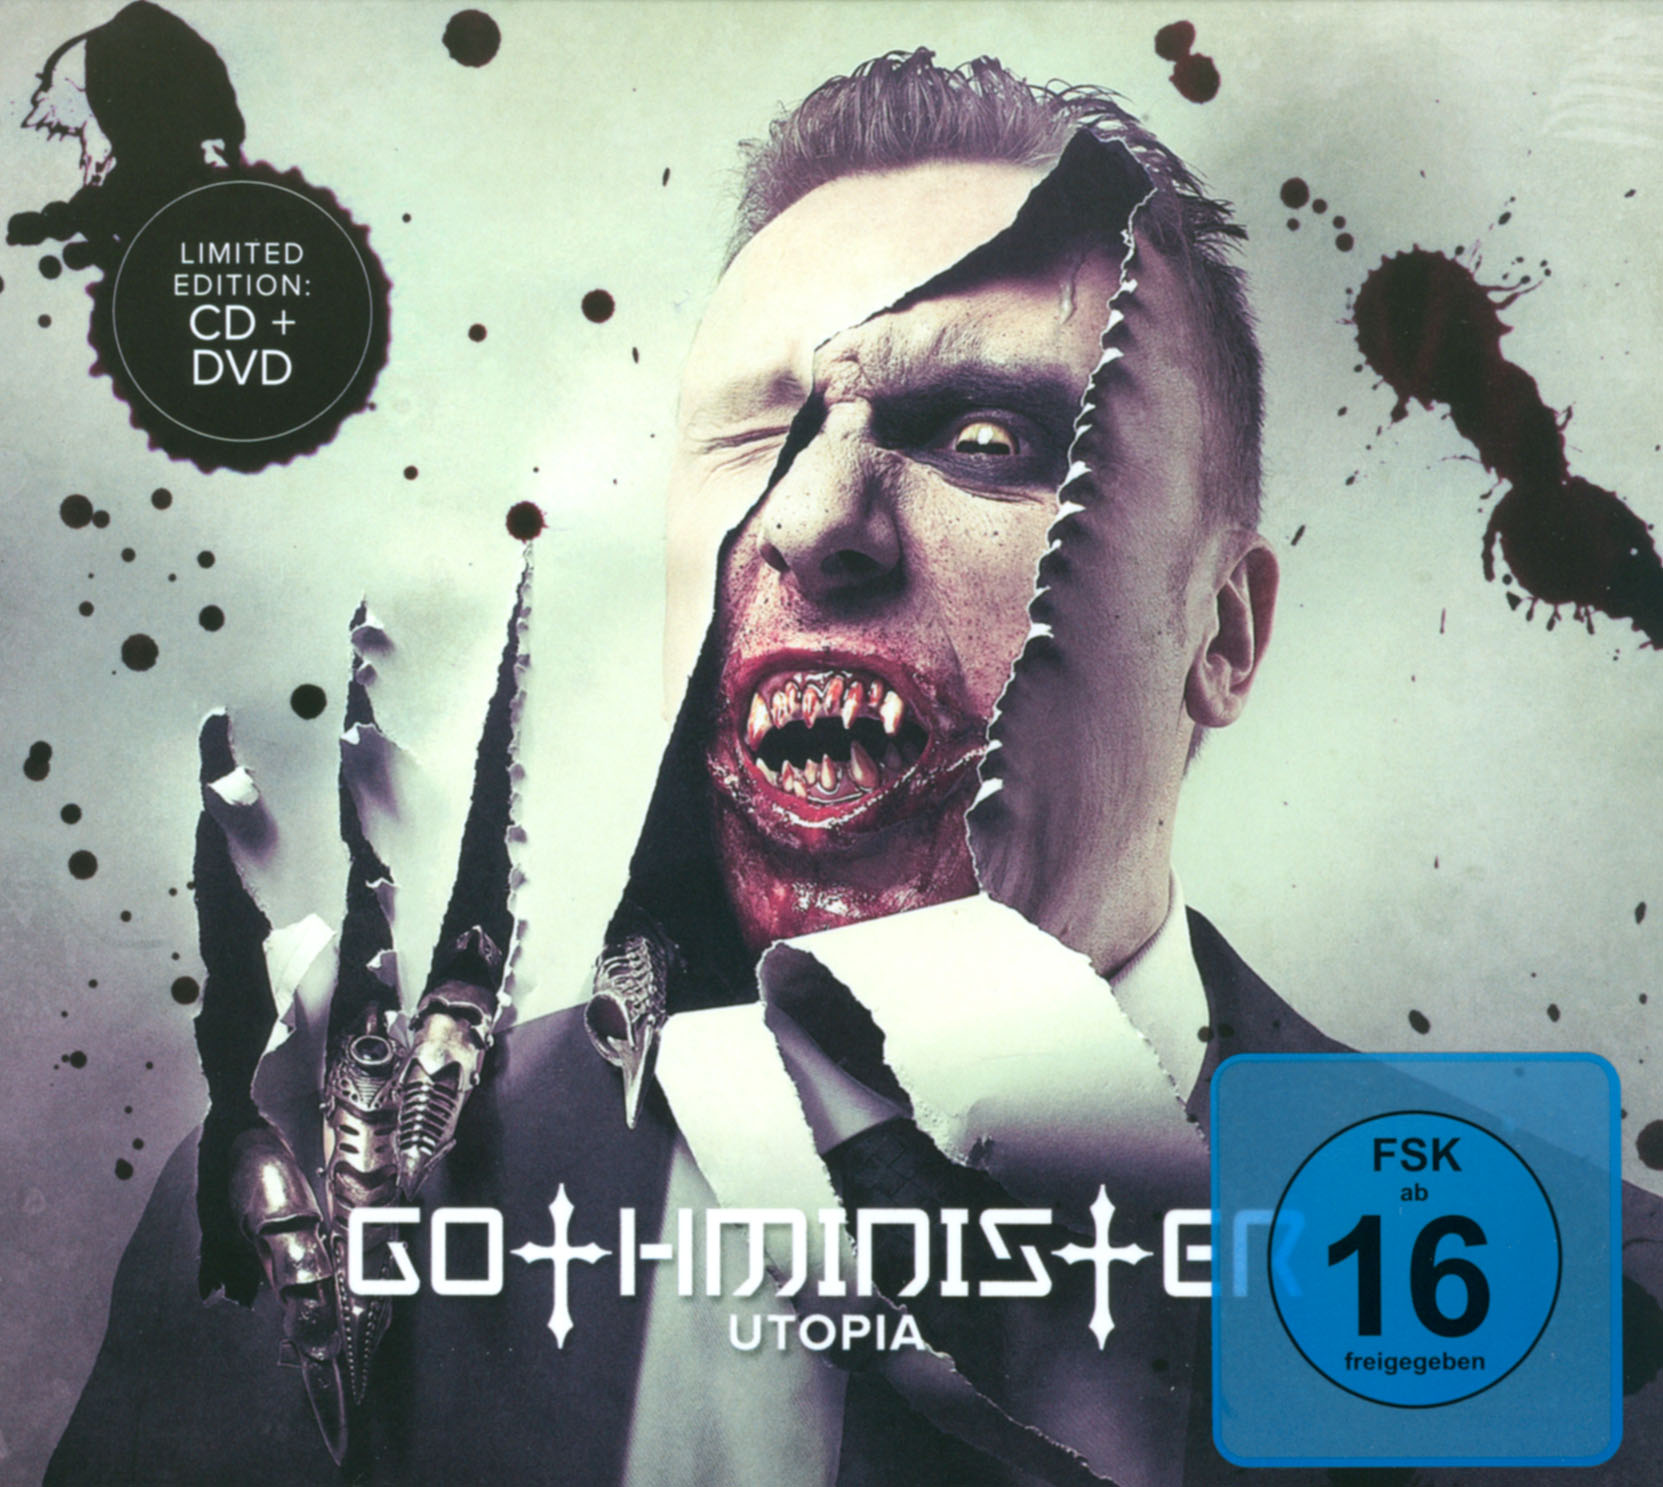 Gothminister: Utopia